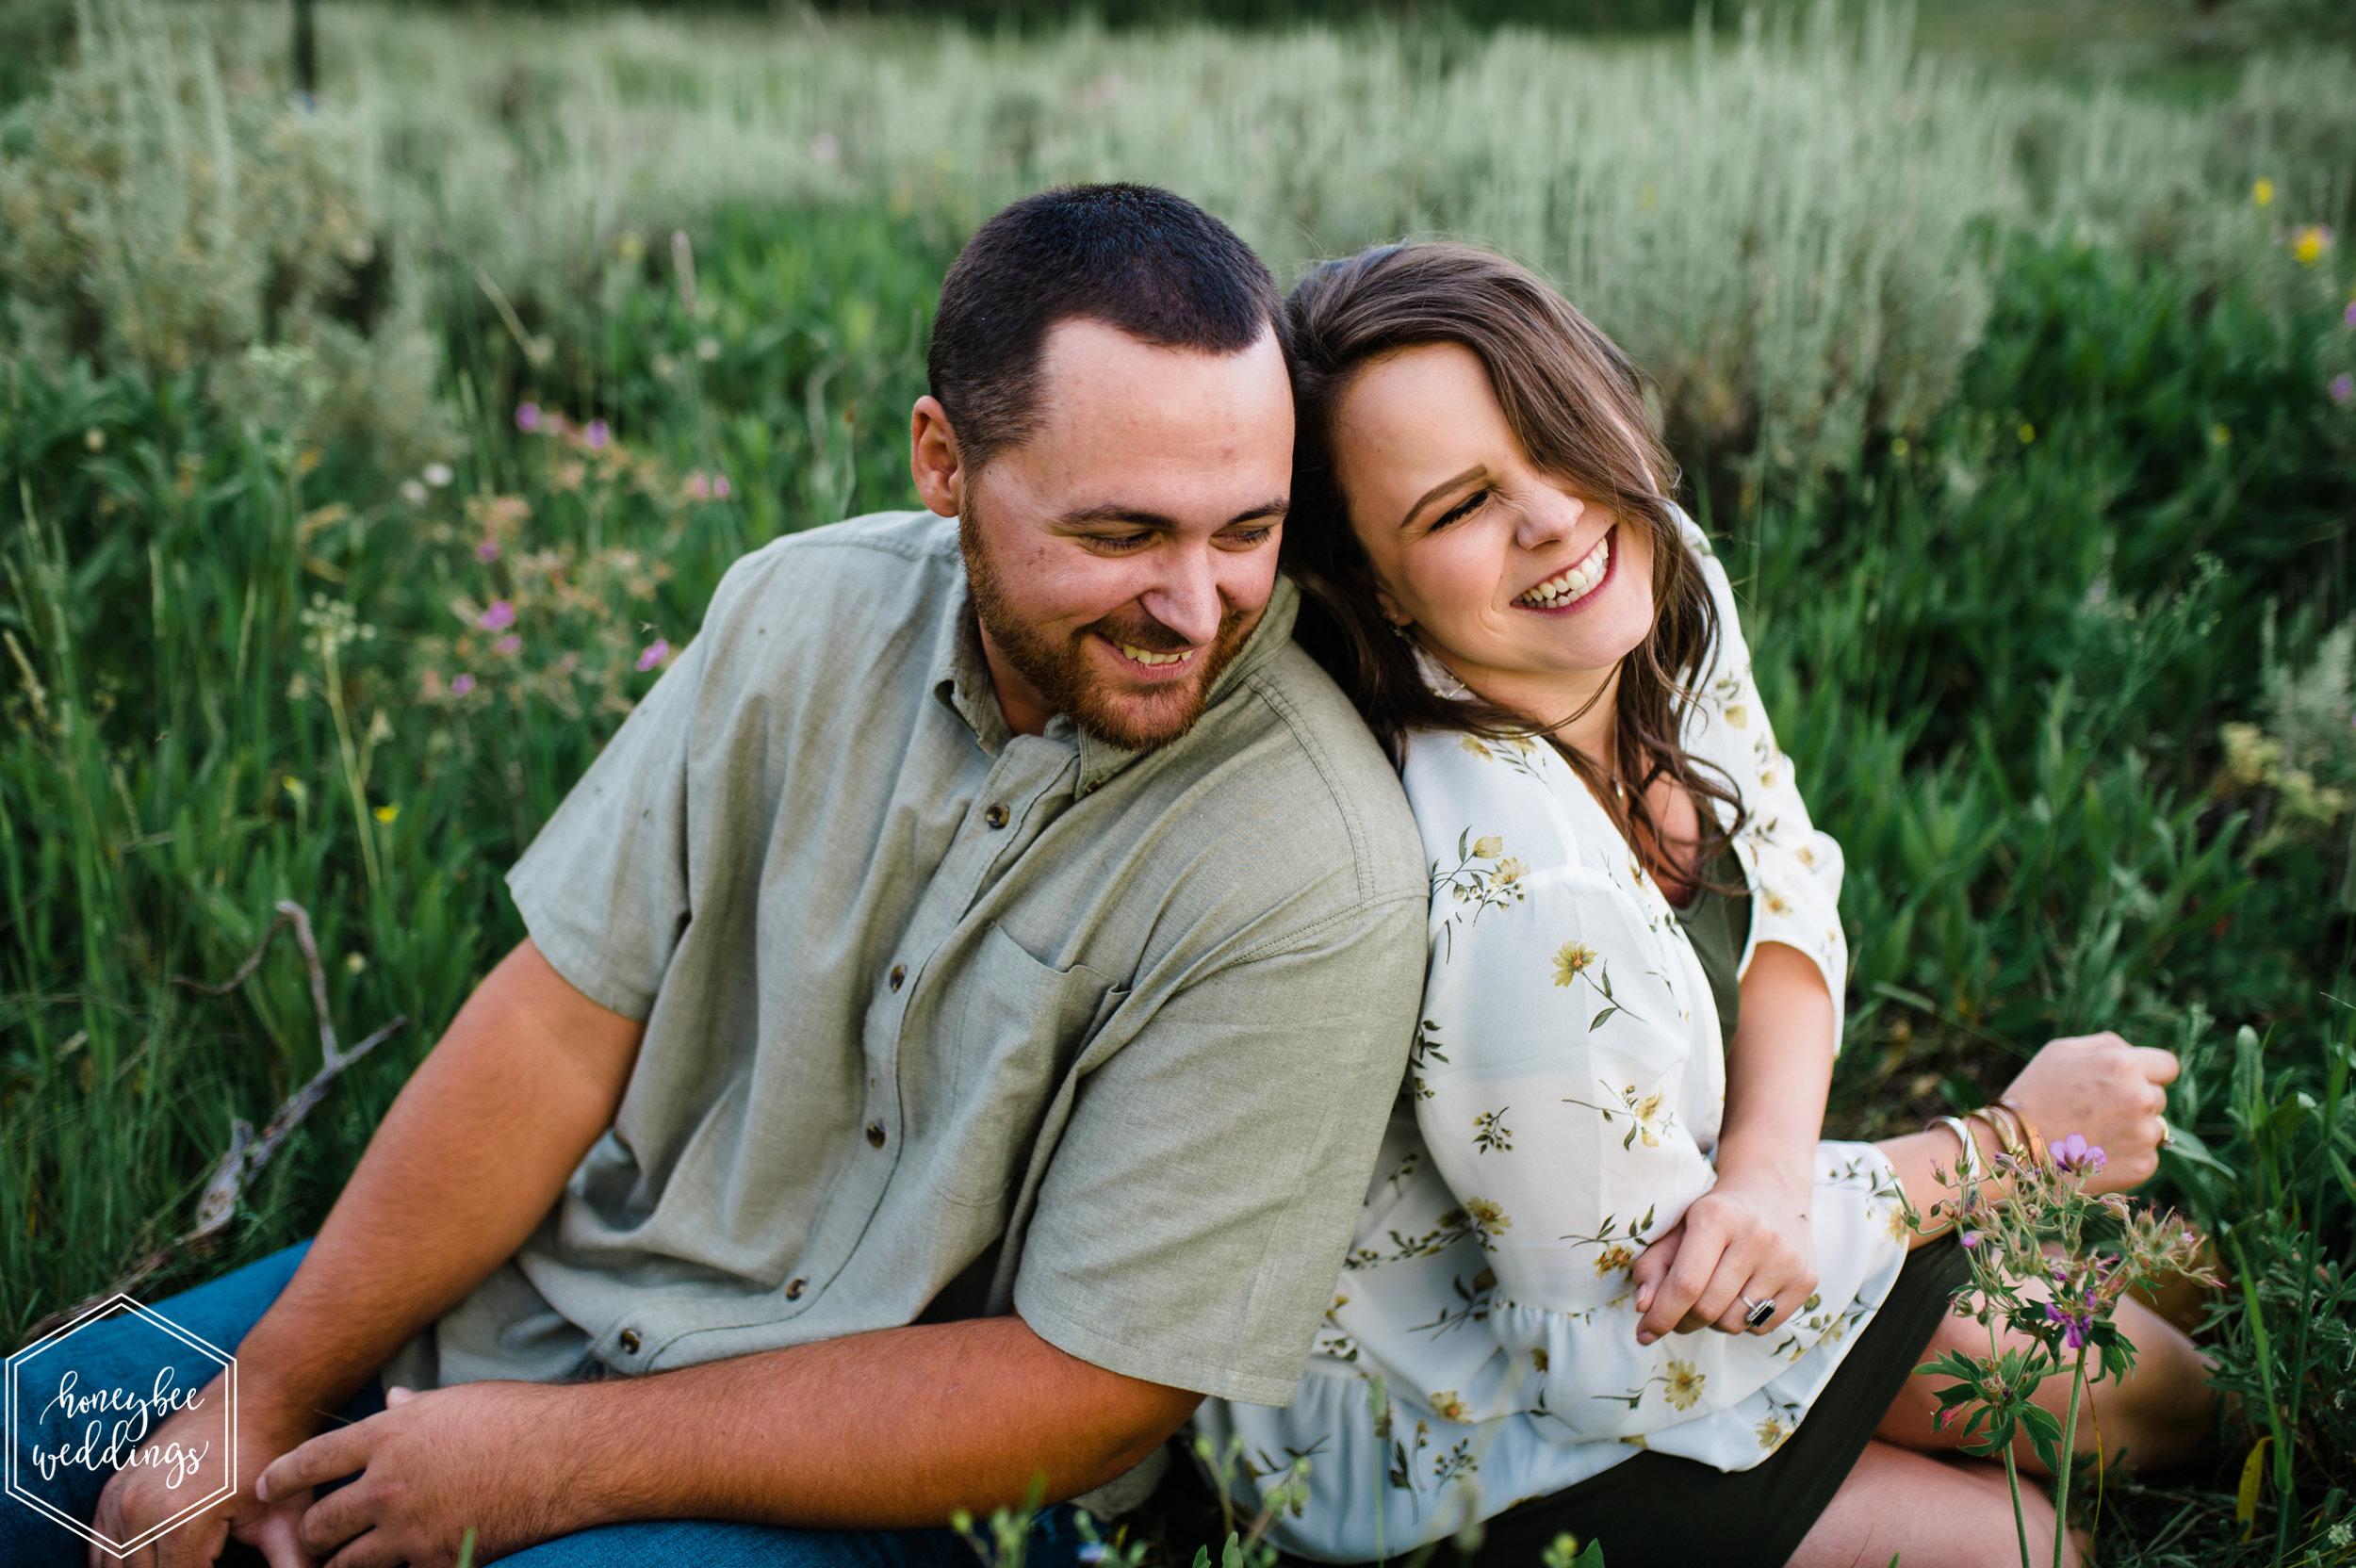 036Yellowstone National Park Wedding Photographer_Montana Engagement Session_Kelsie & DJ_July 24, 2019-394.jpg